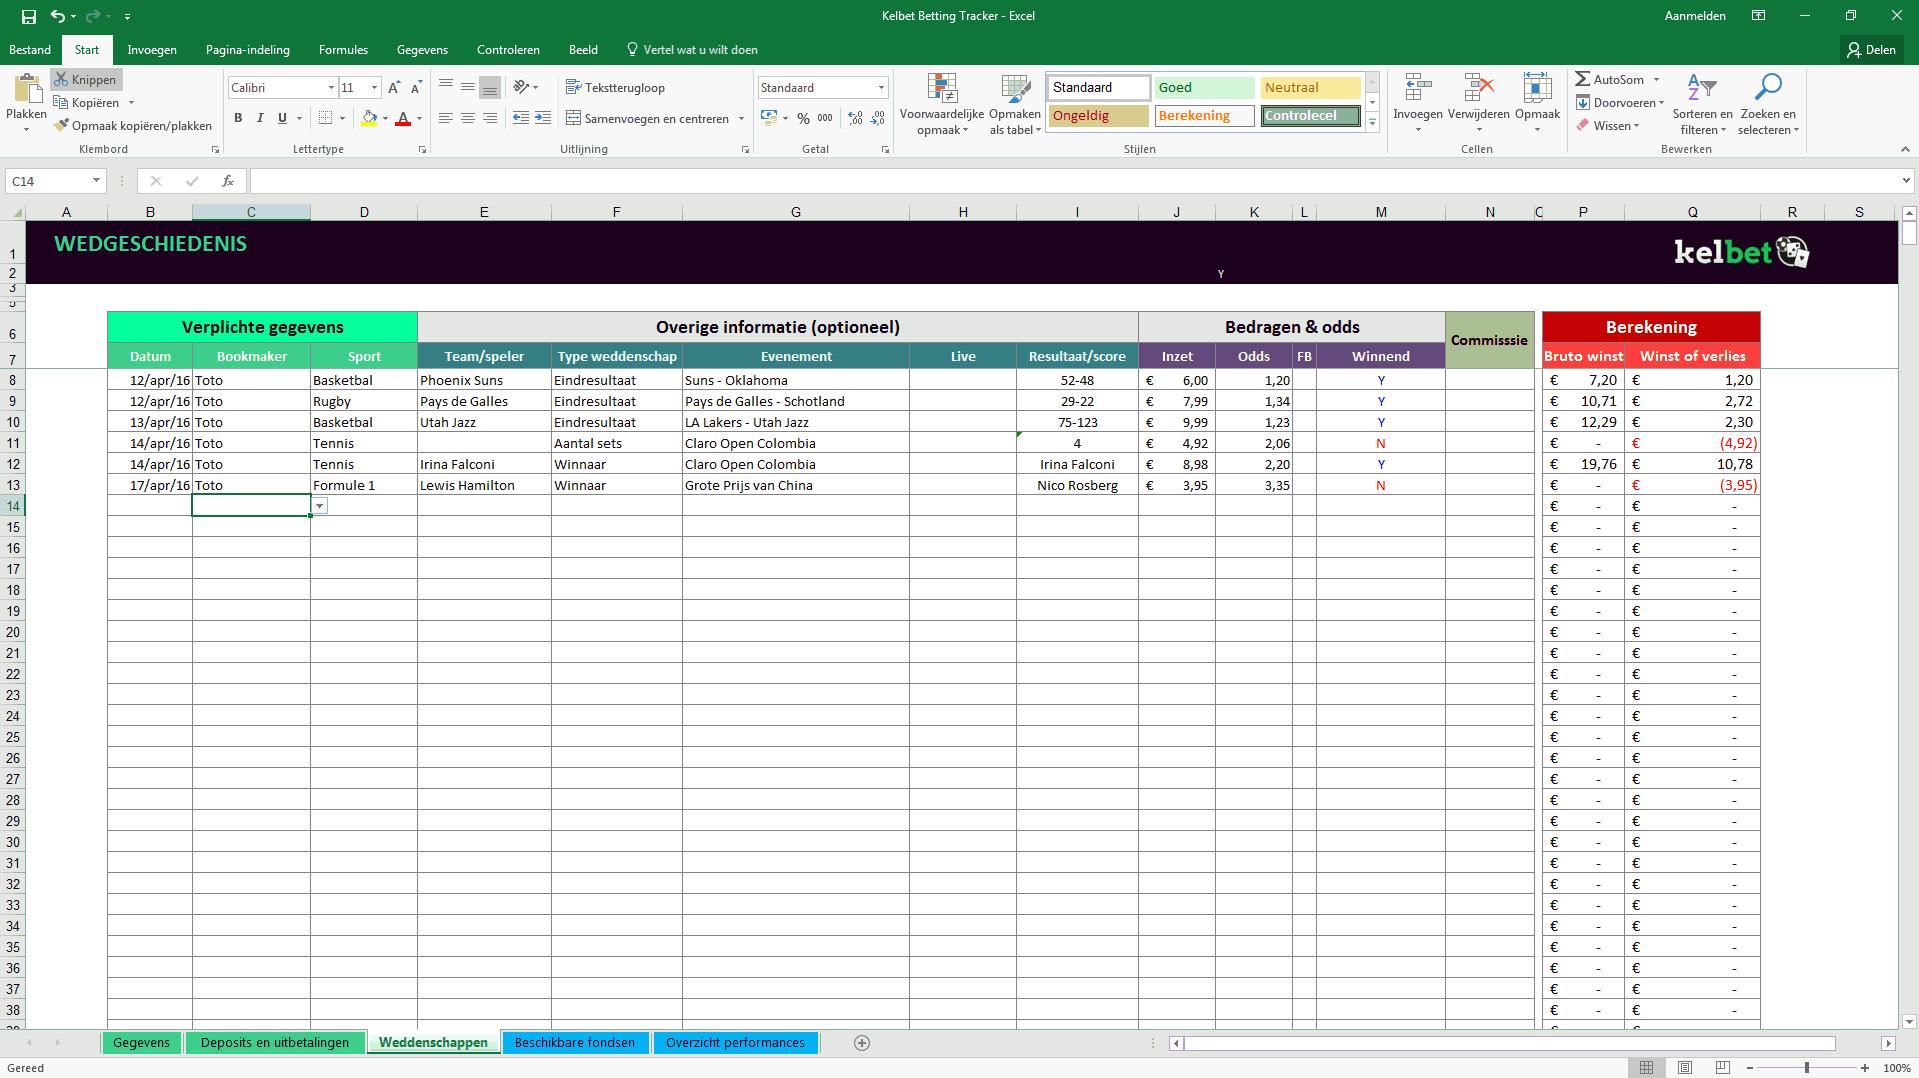 Kelbet betting tracker 3